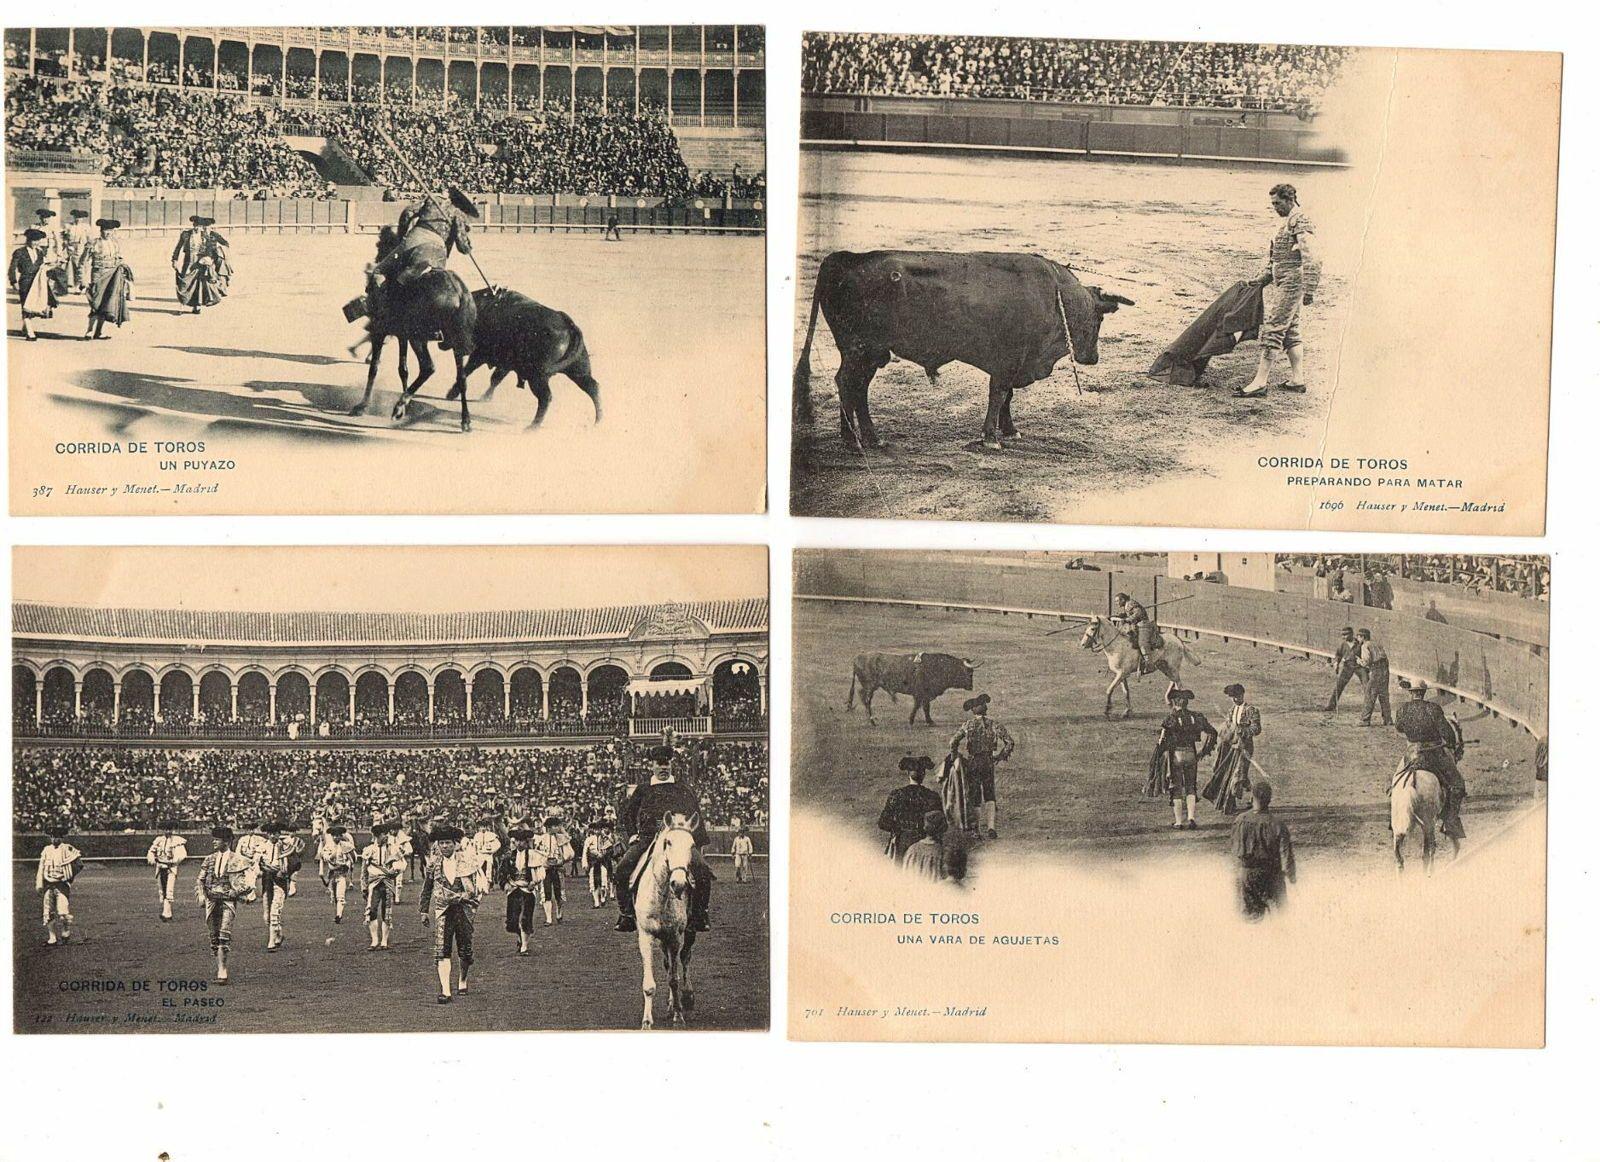 Cartes postales tauromachie